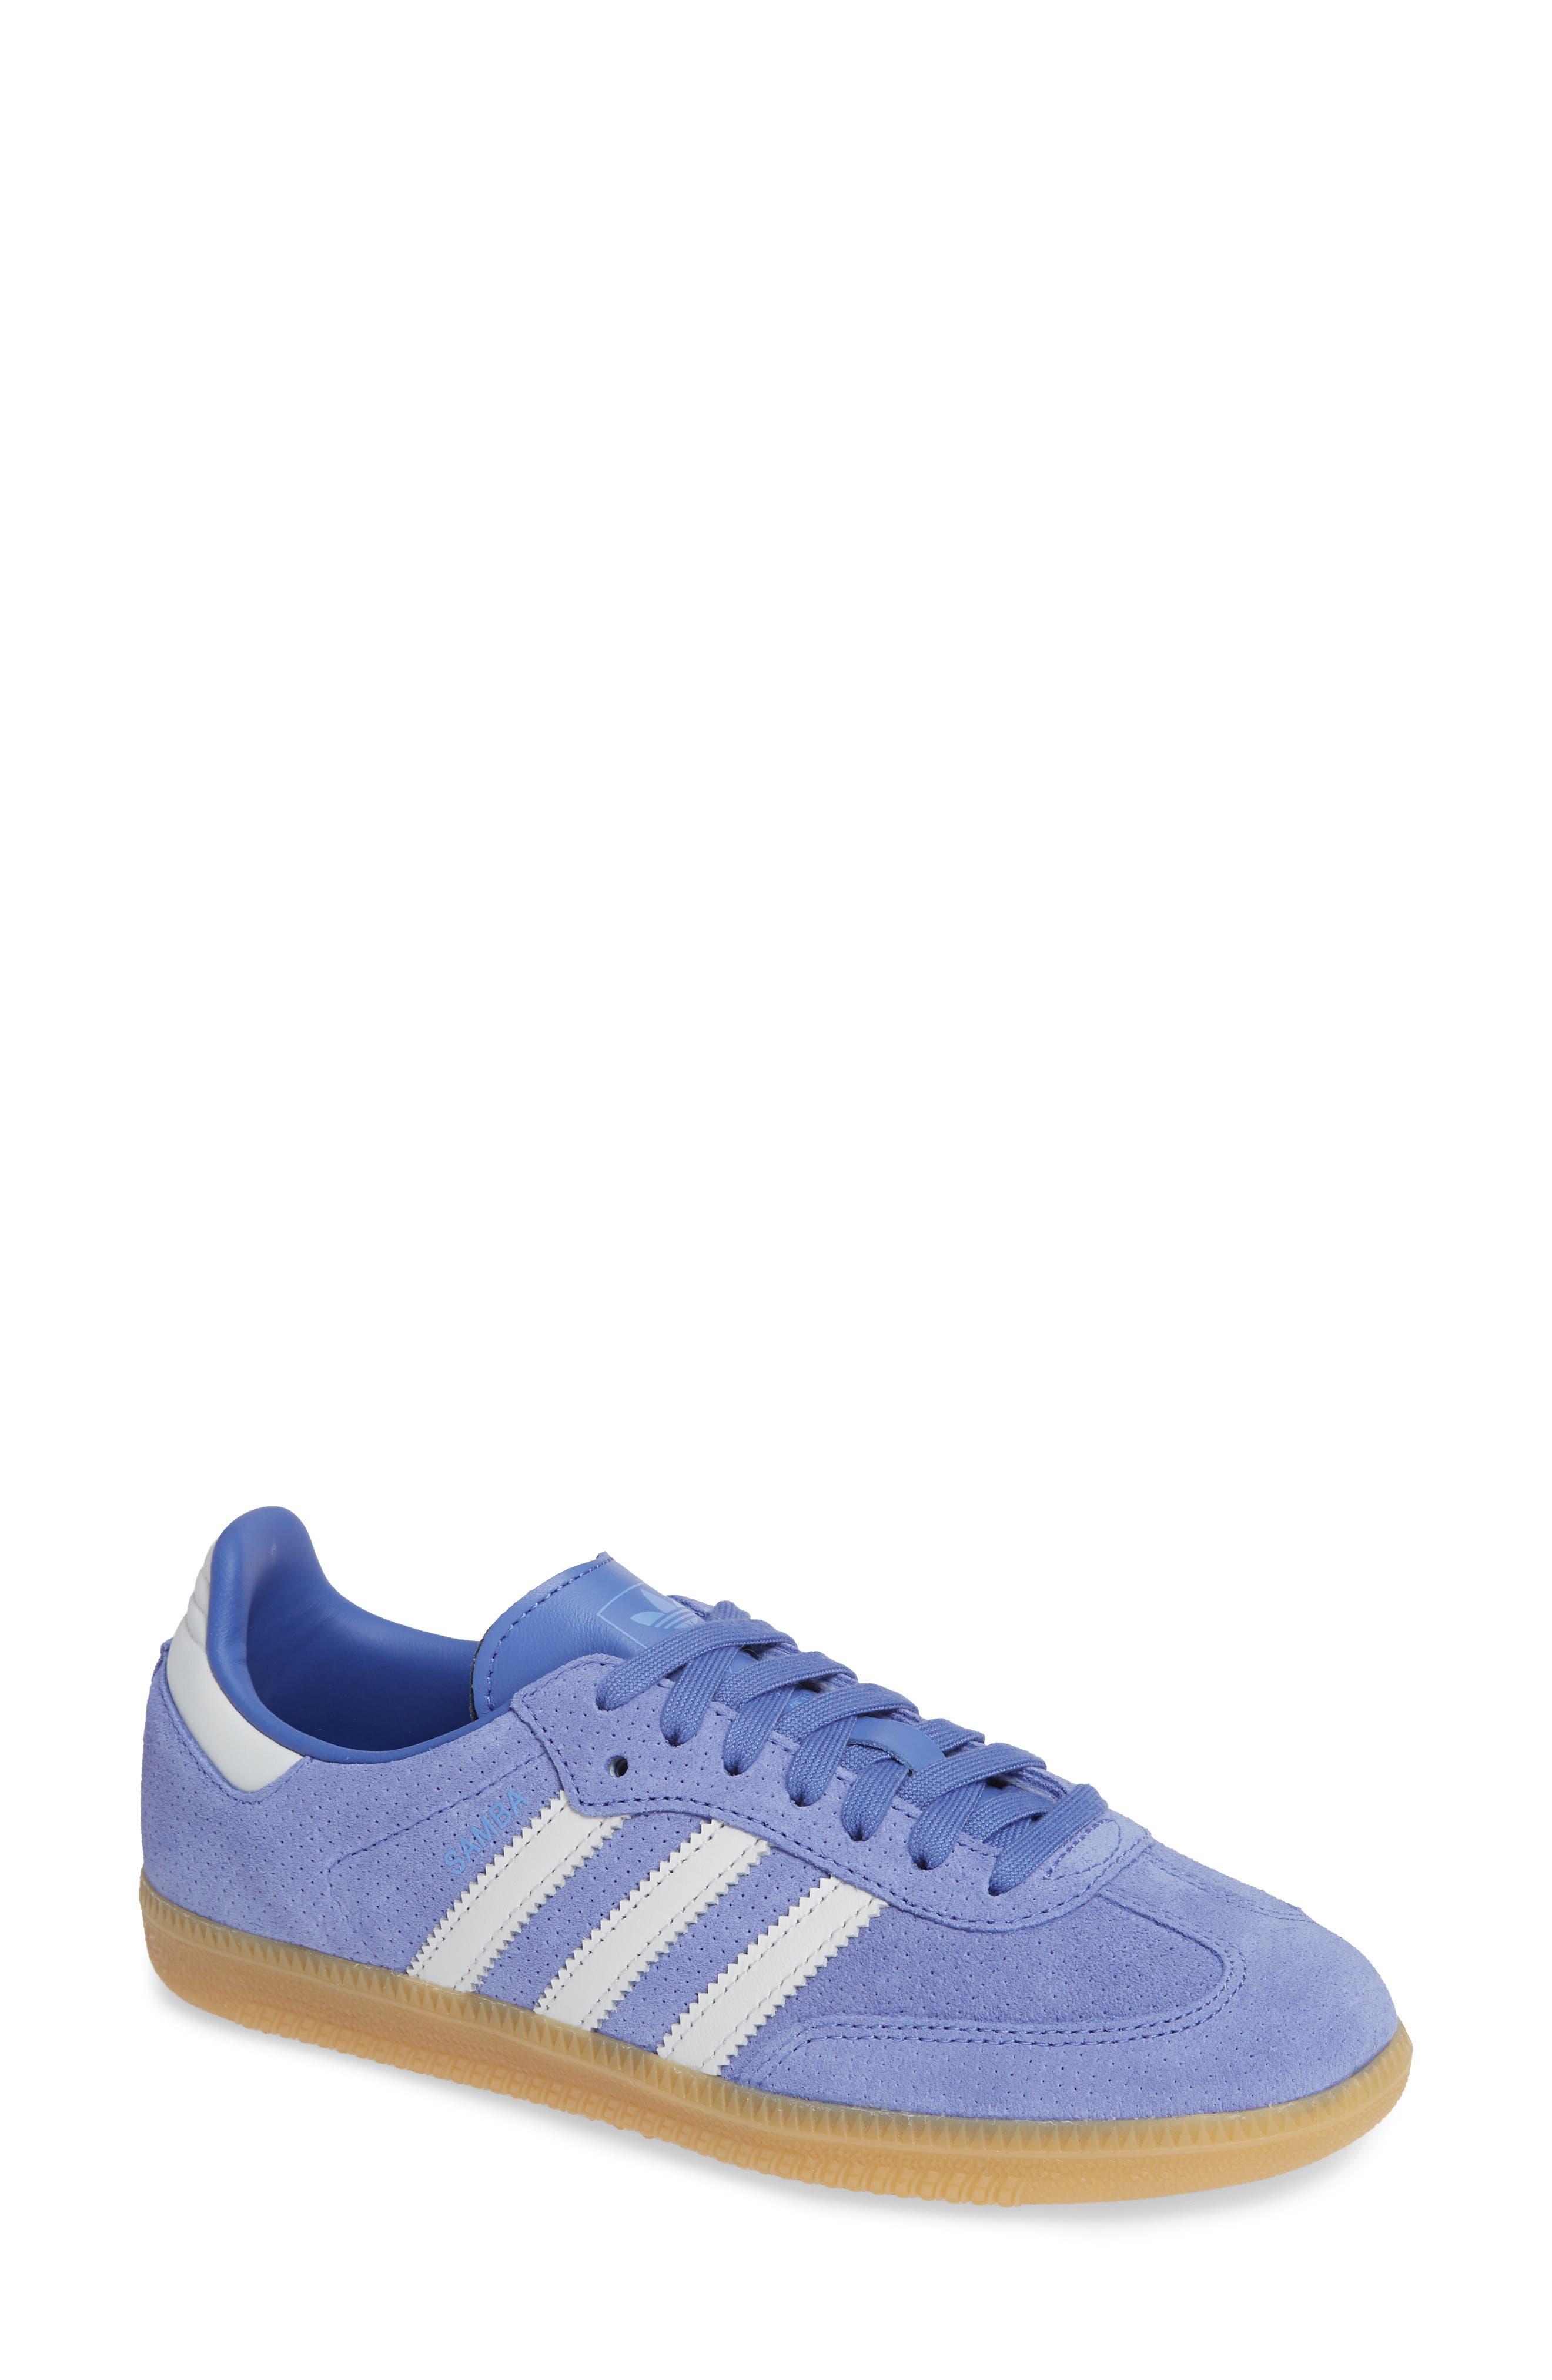 Samba OG Low Top Sneaker,                             Main thumbnail 1, color,                             536